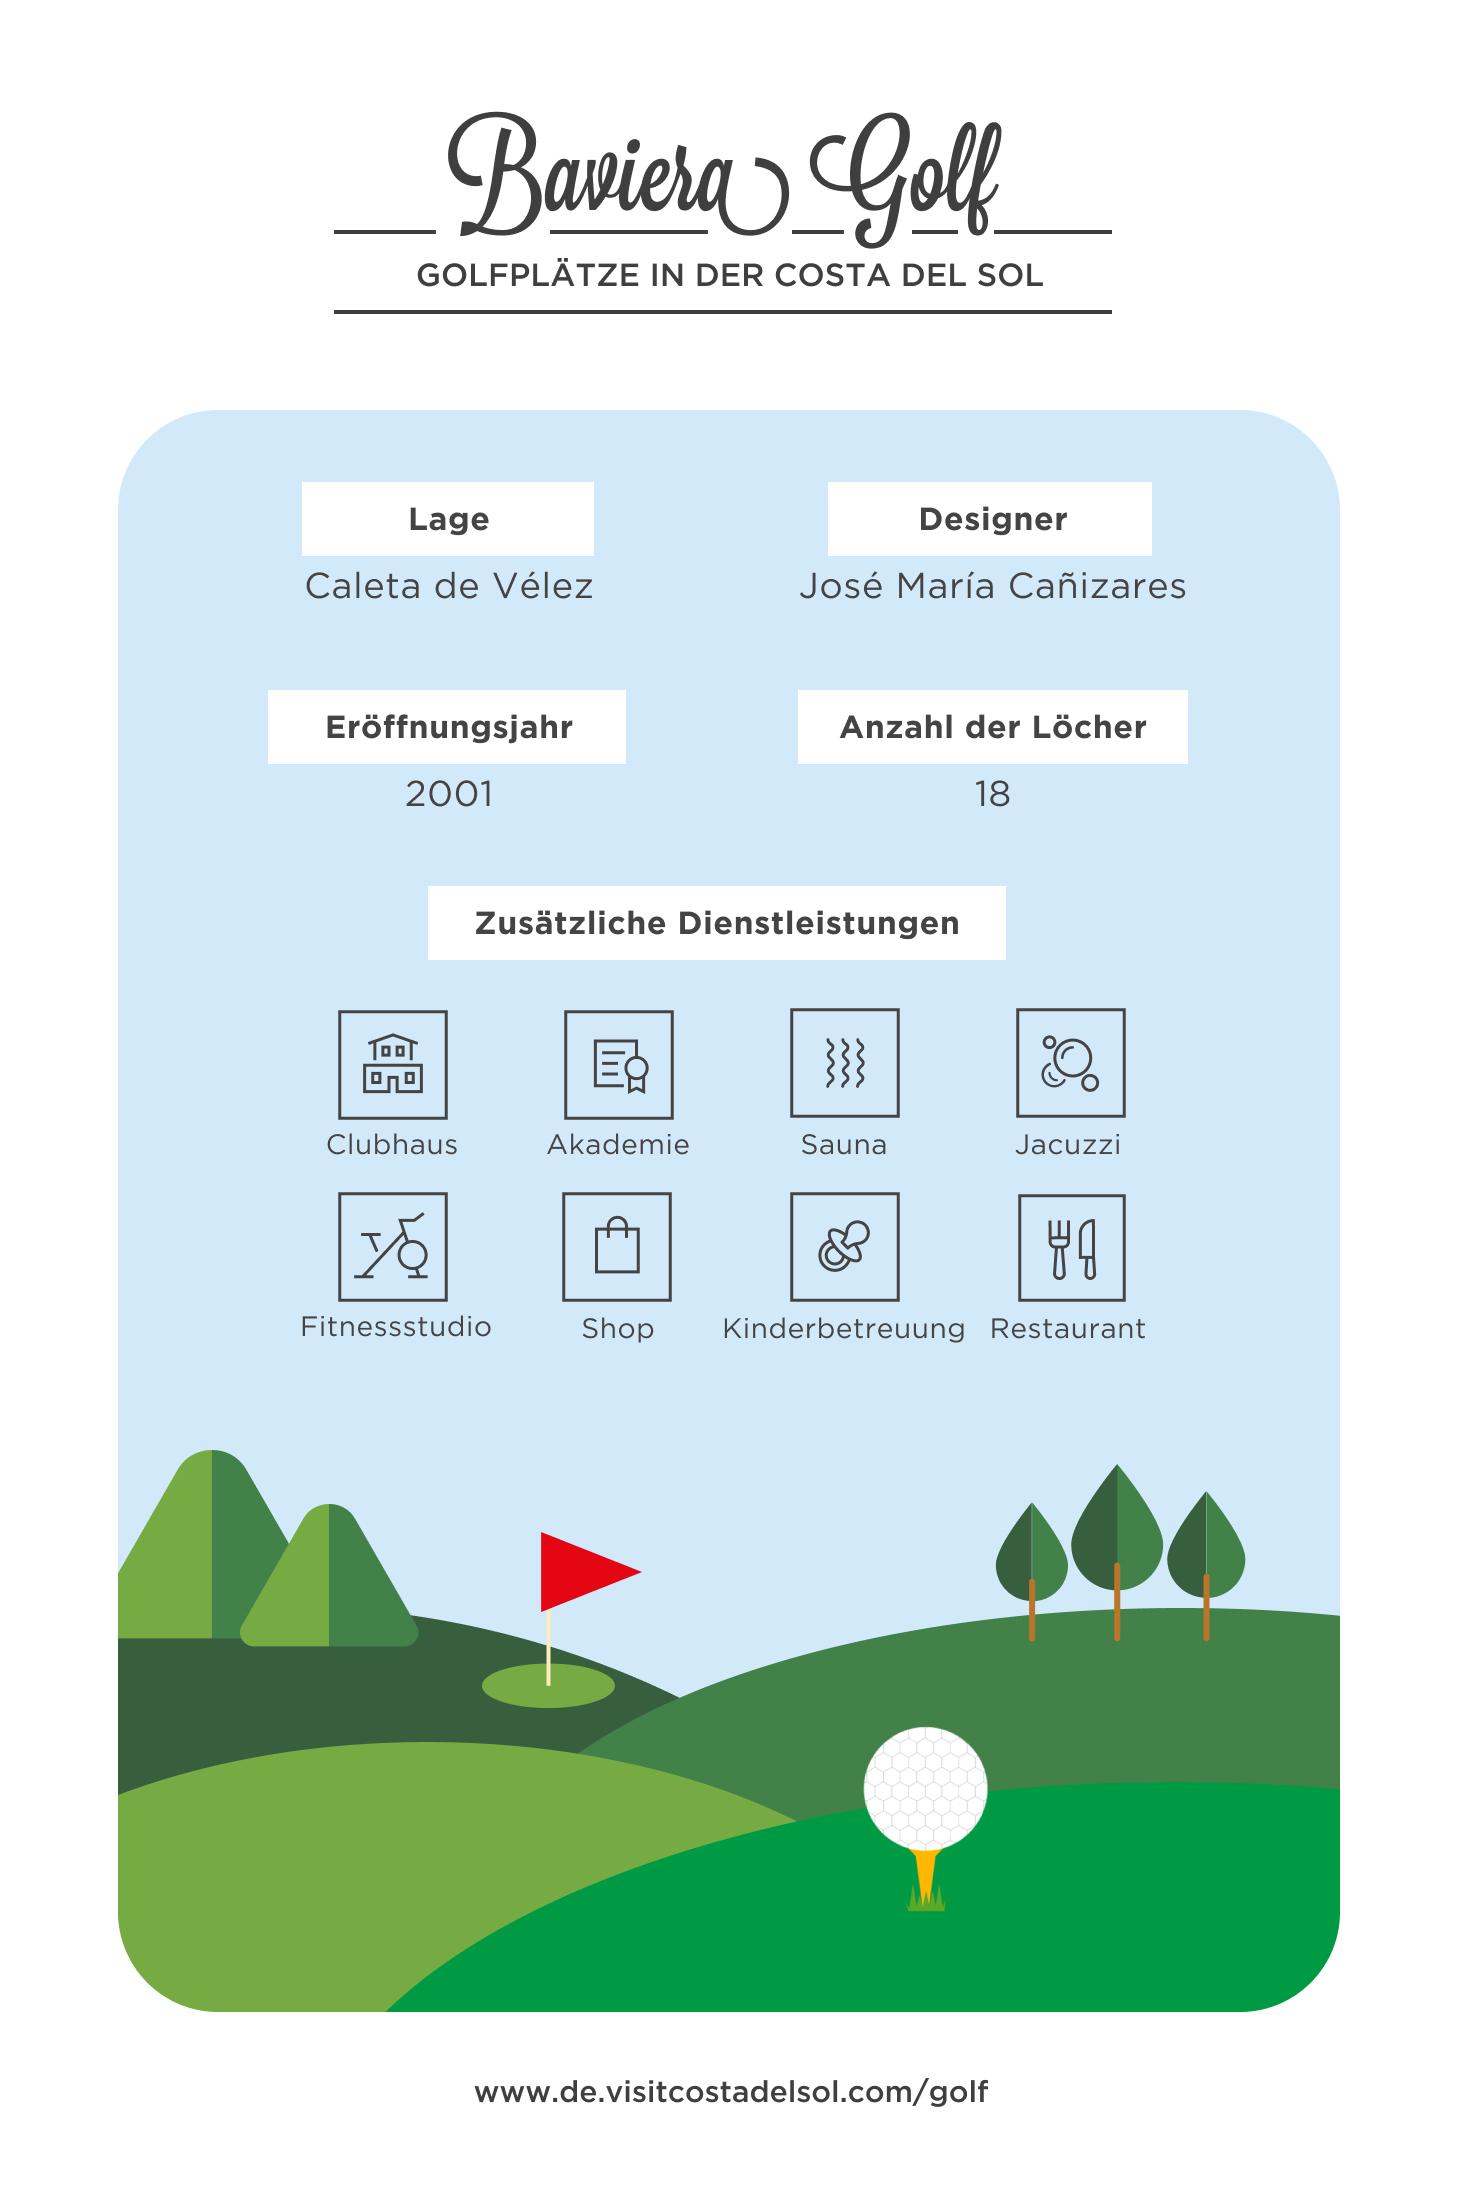 csol_#13_infografia_golf_baviera-DE